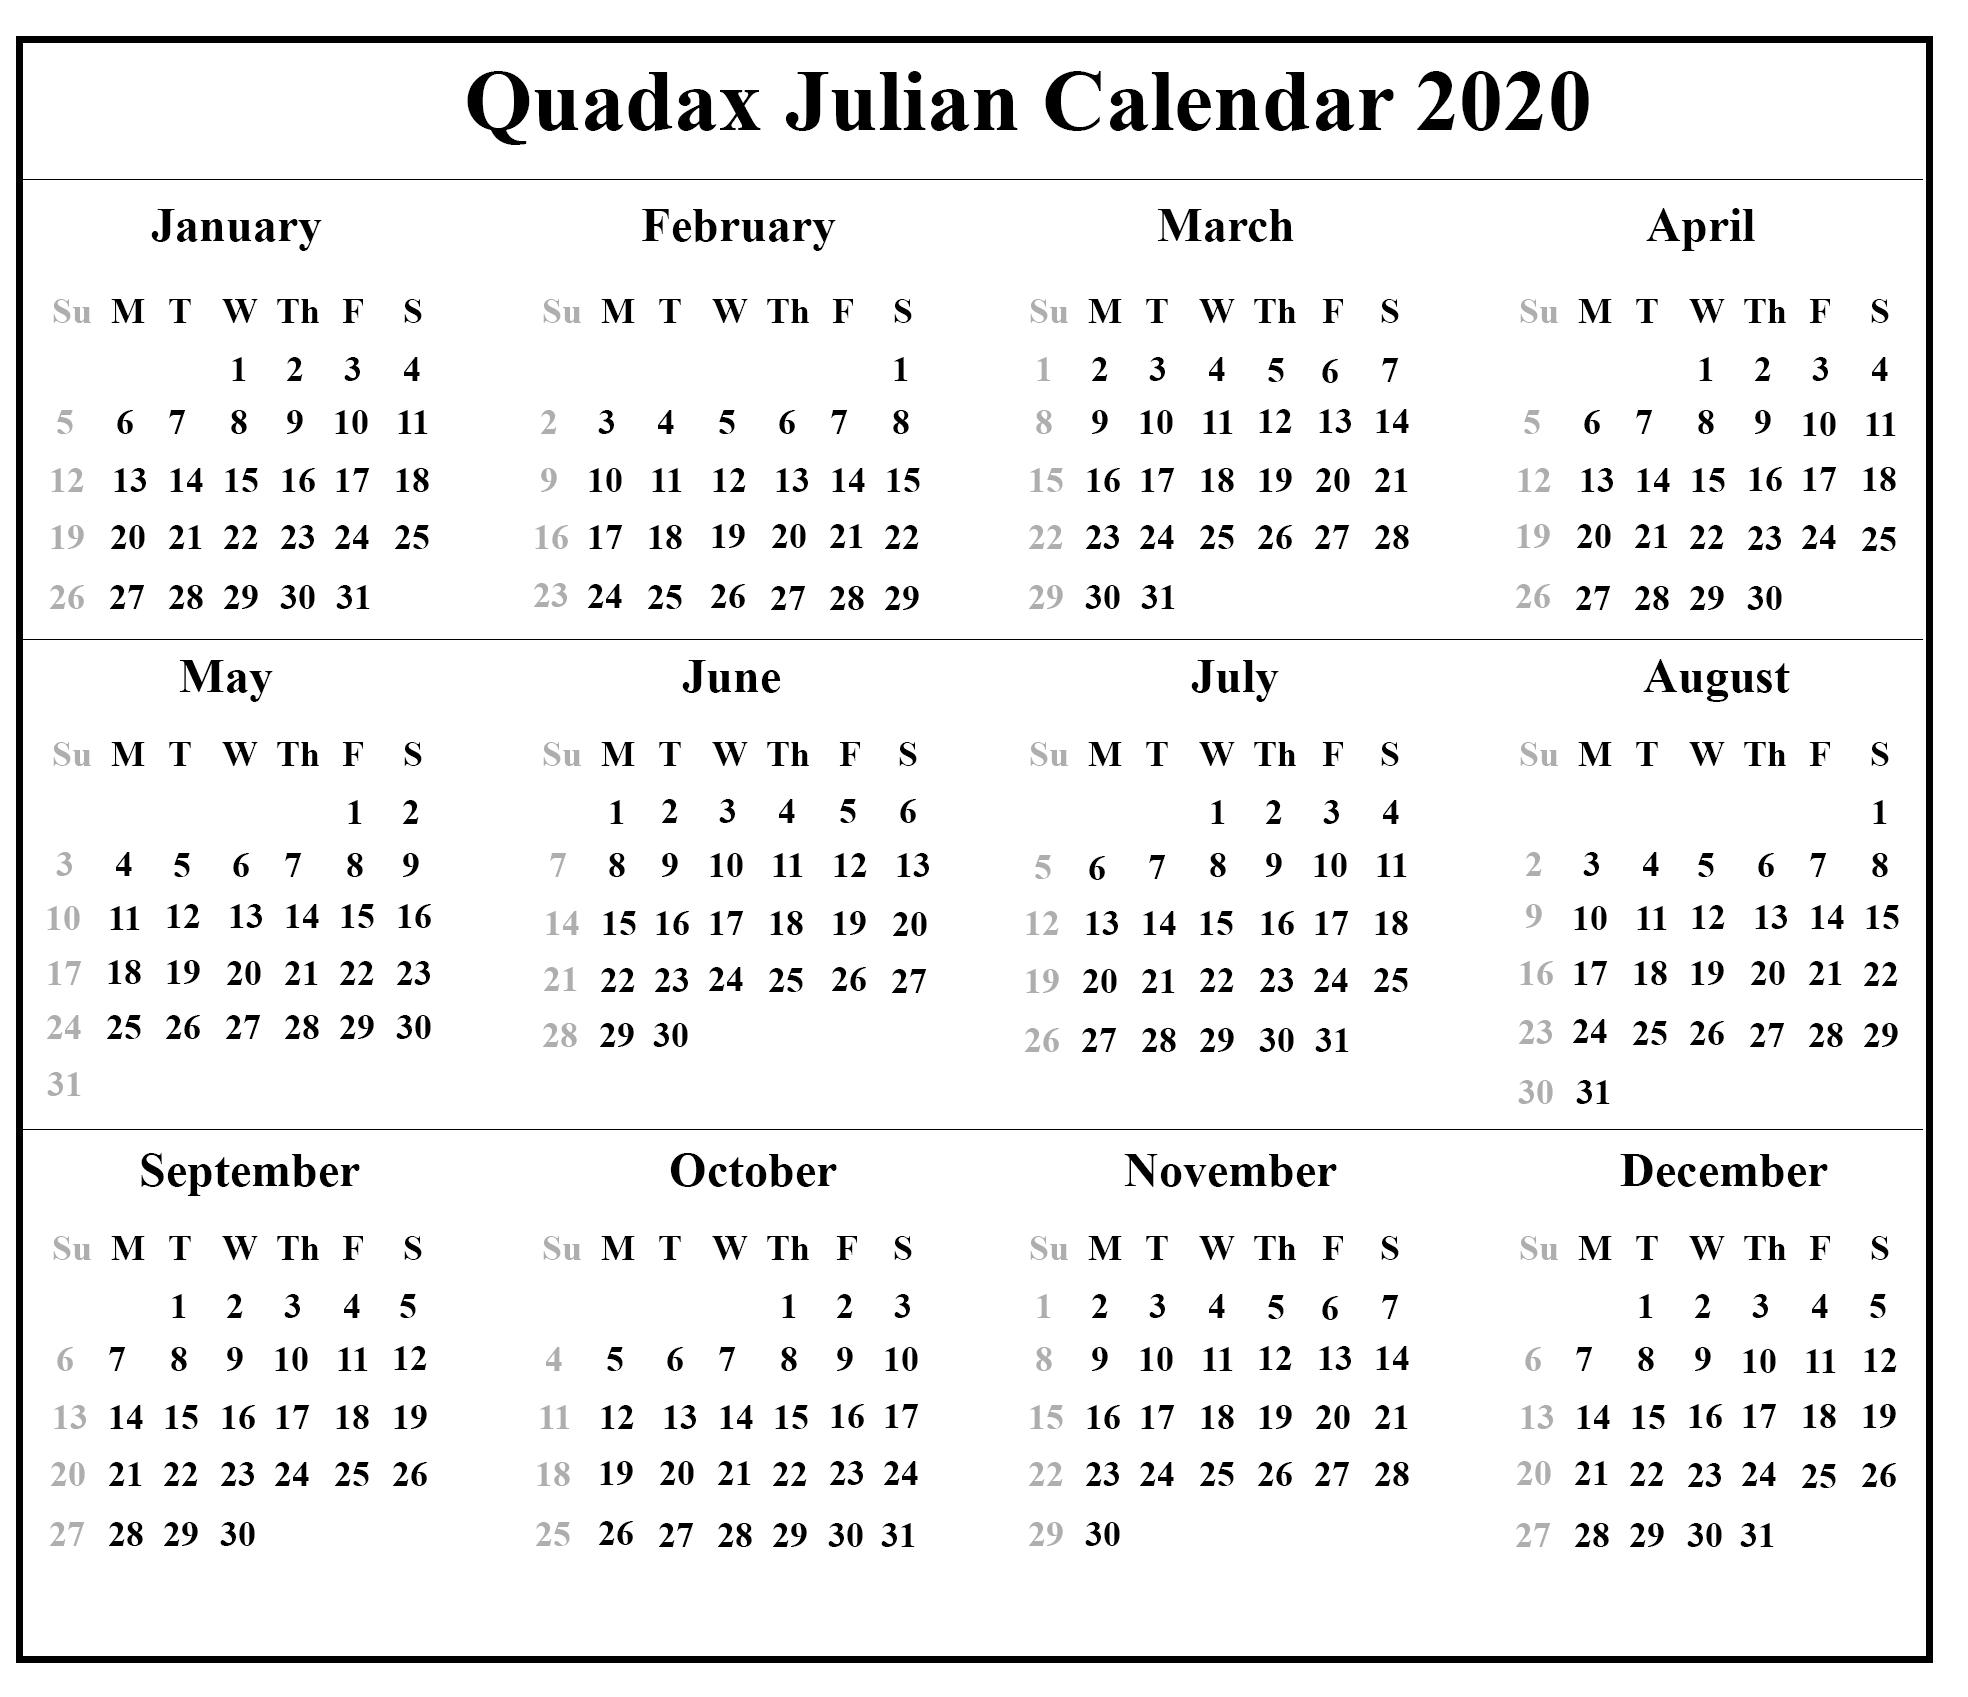 2020 Julian Date Calendar Printable - Mance